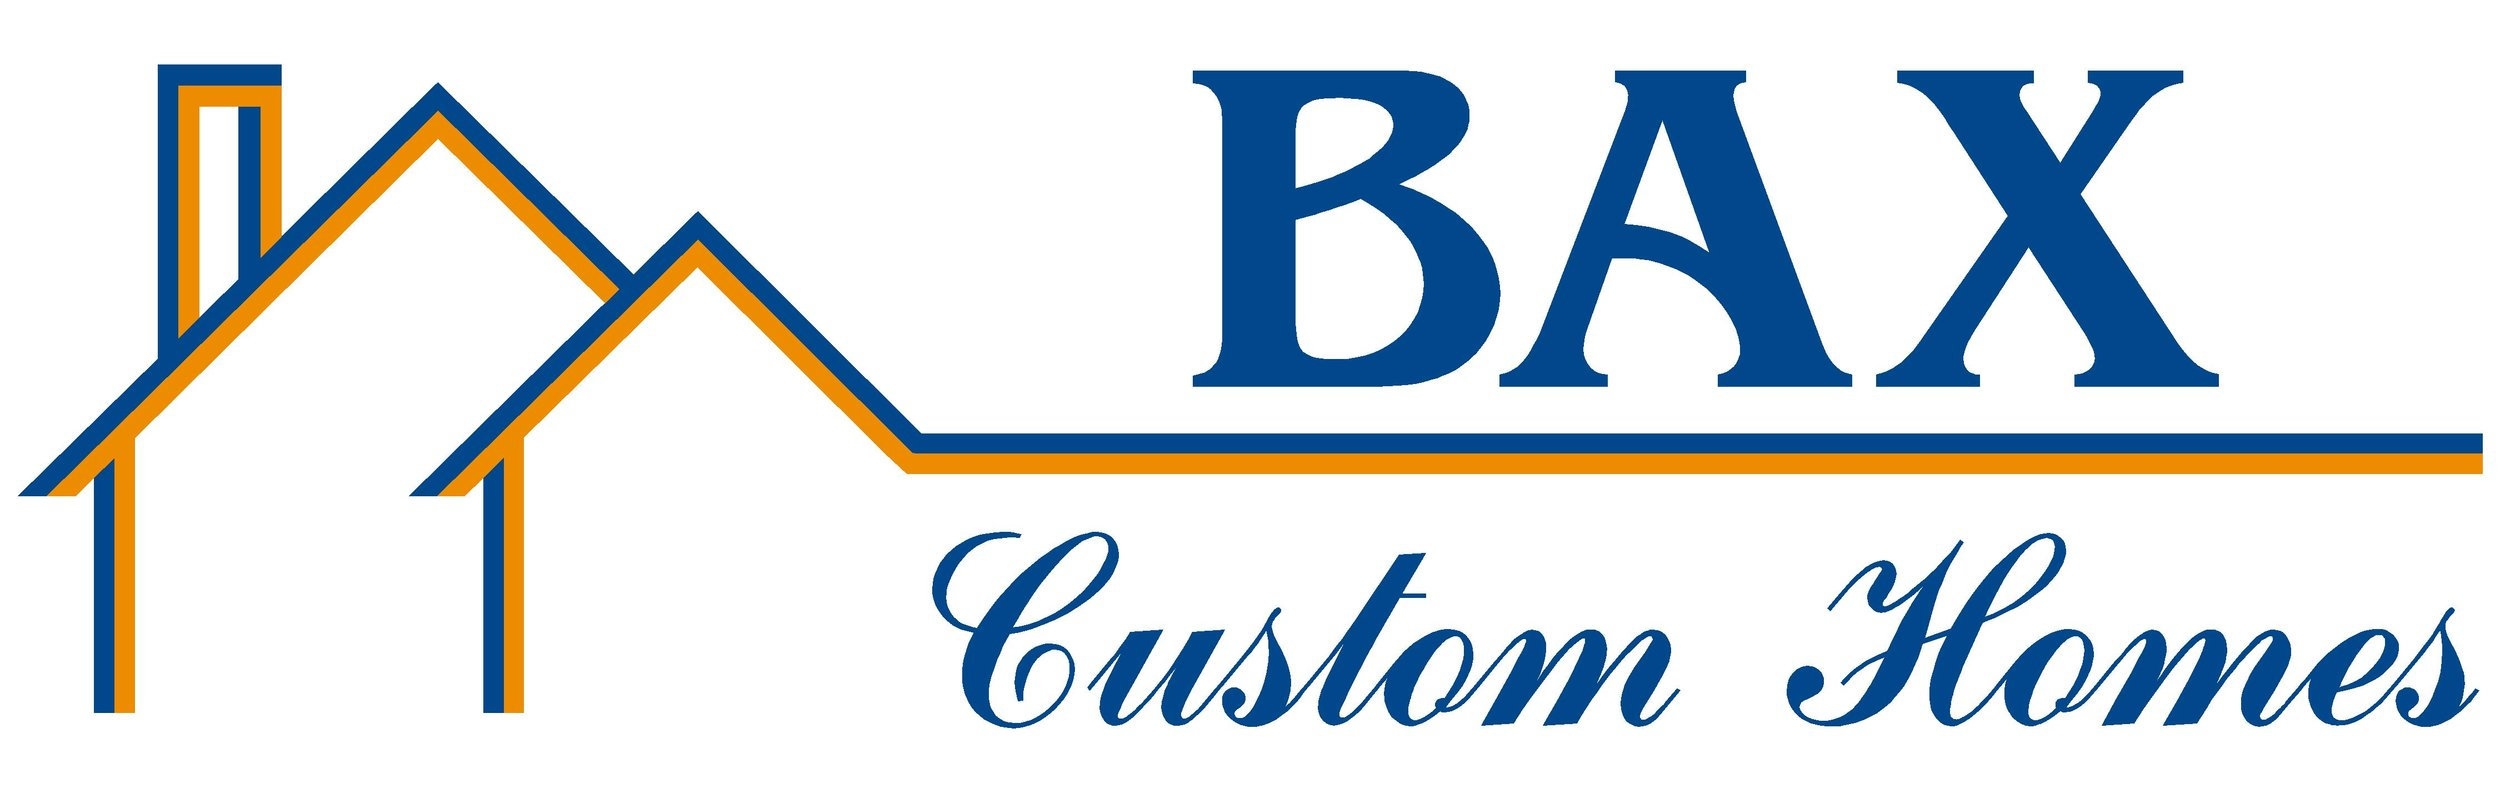 Bax_Logo.jpg